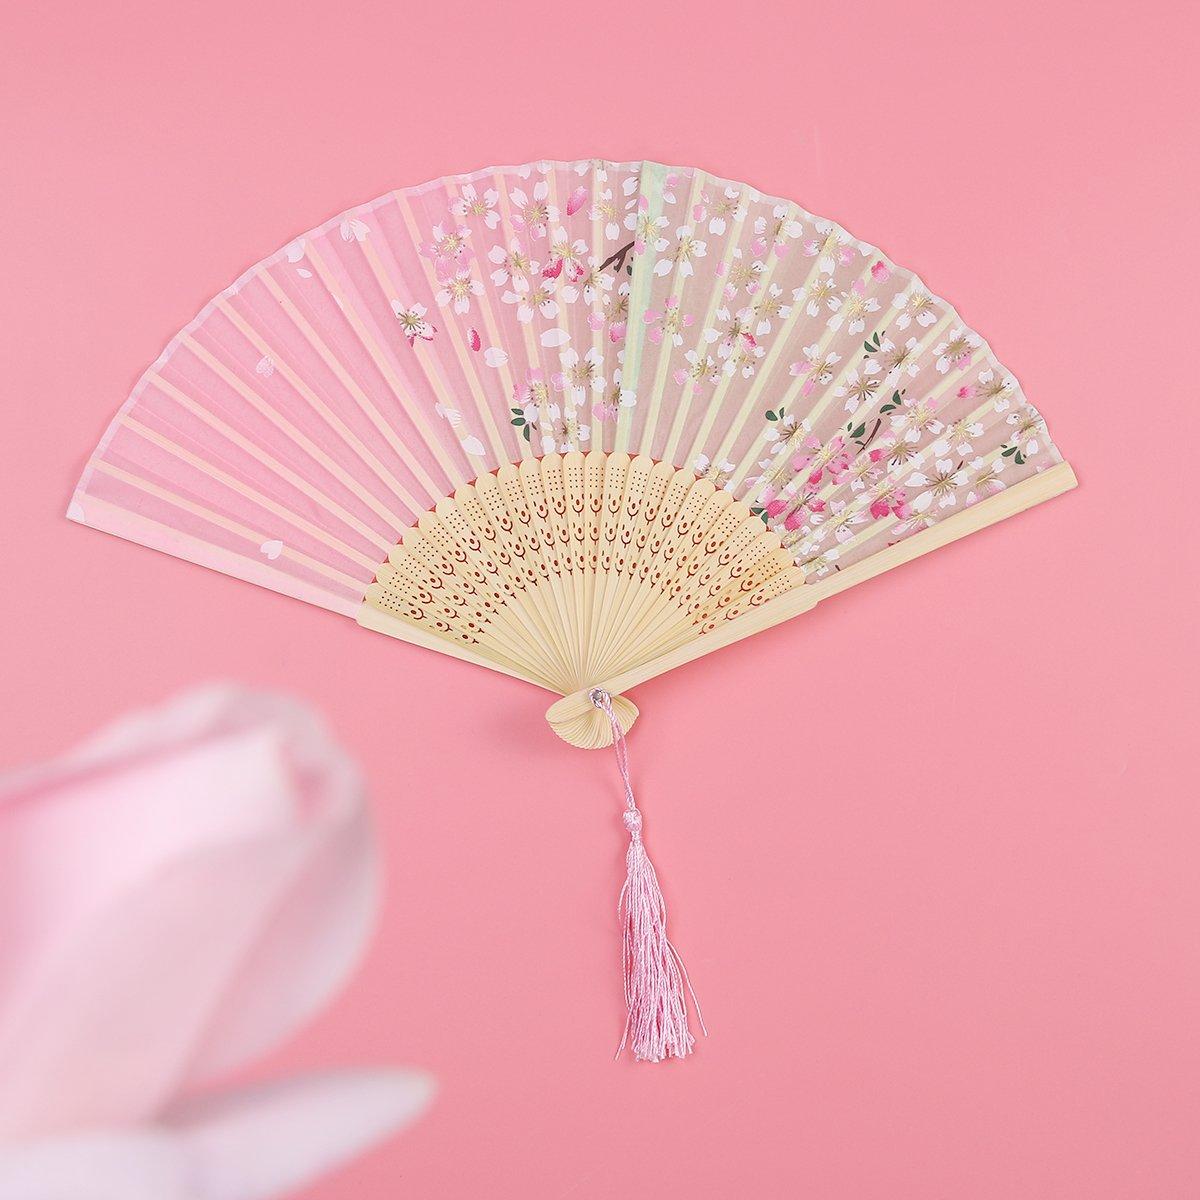 Amazon.com: Tinksky Pack of Japanese Cherry Blossom Folding Fan Silk ...